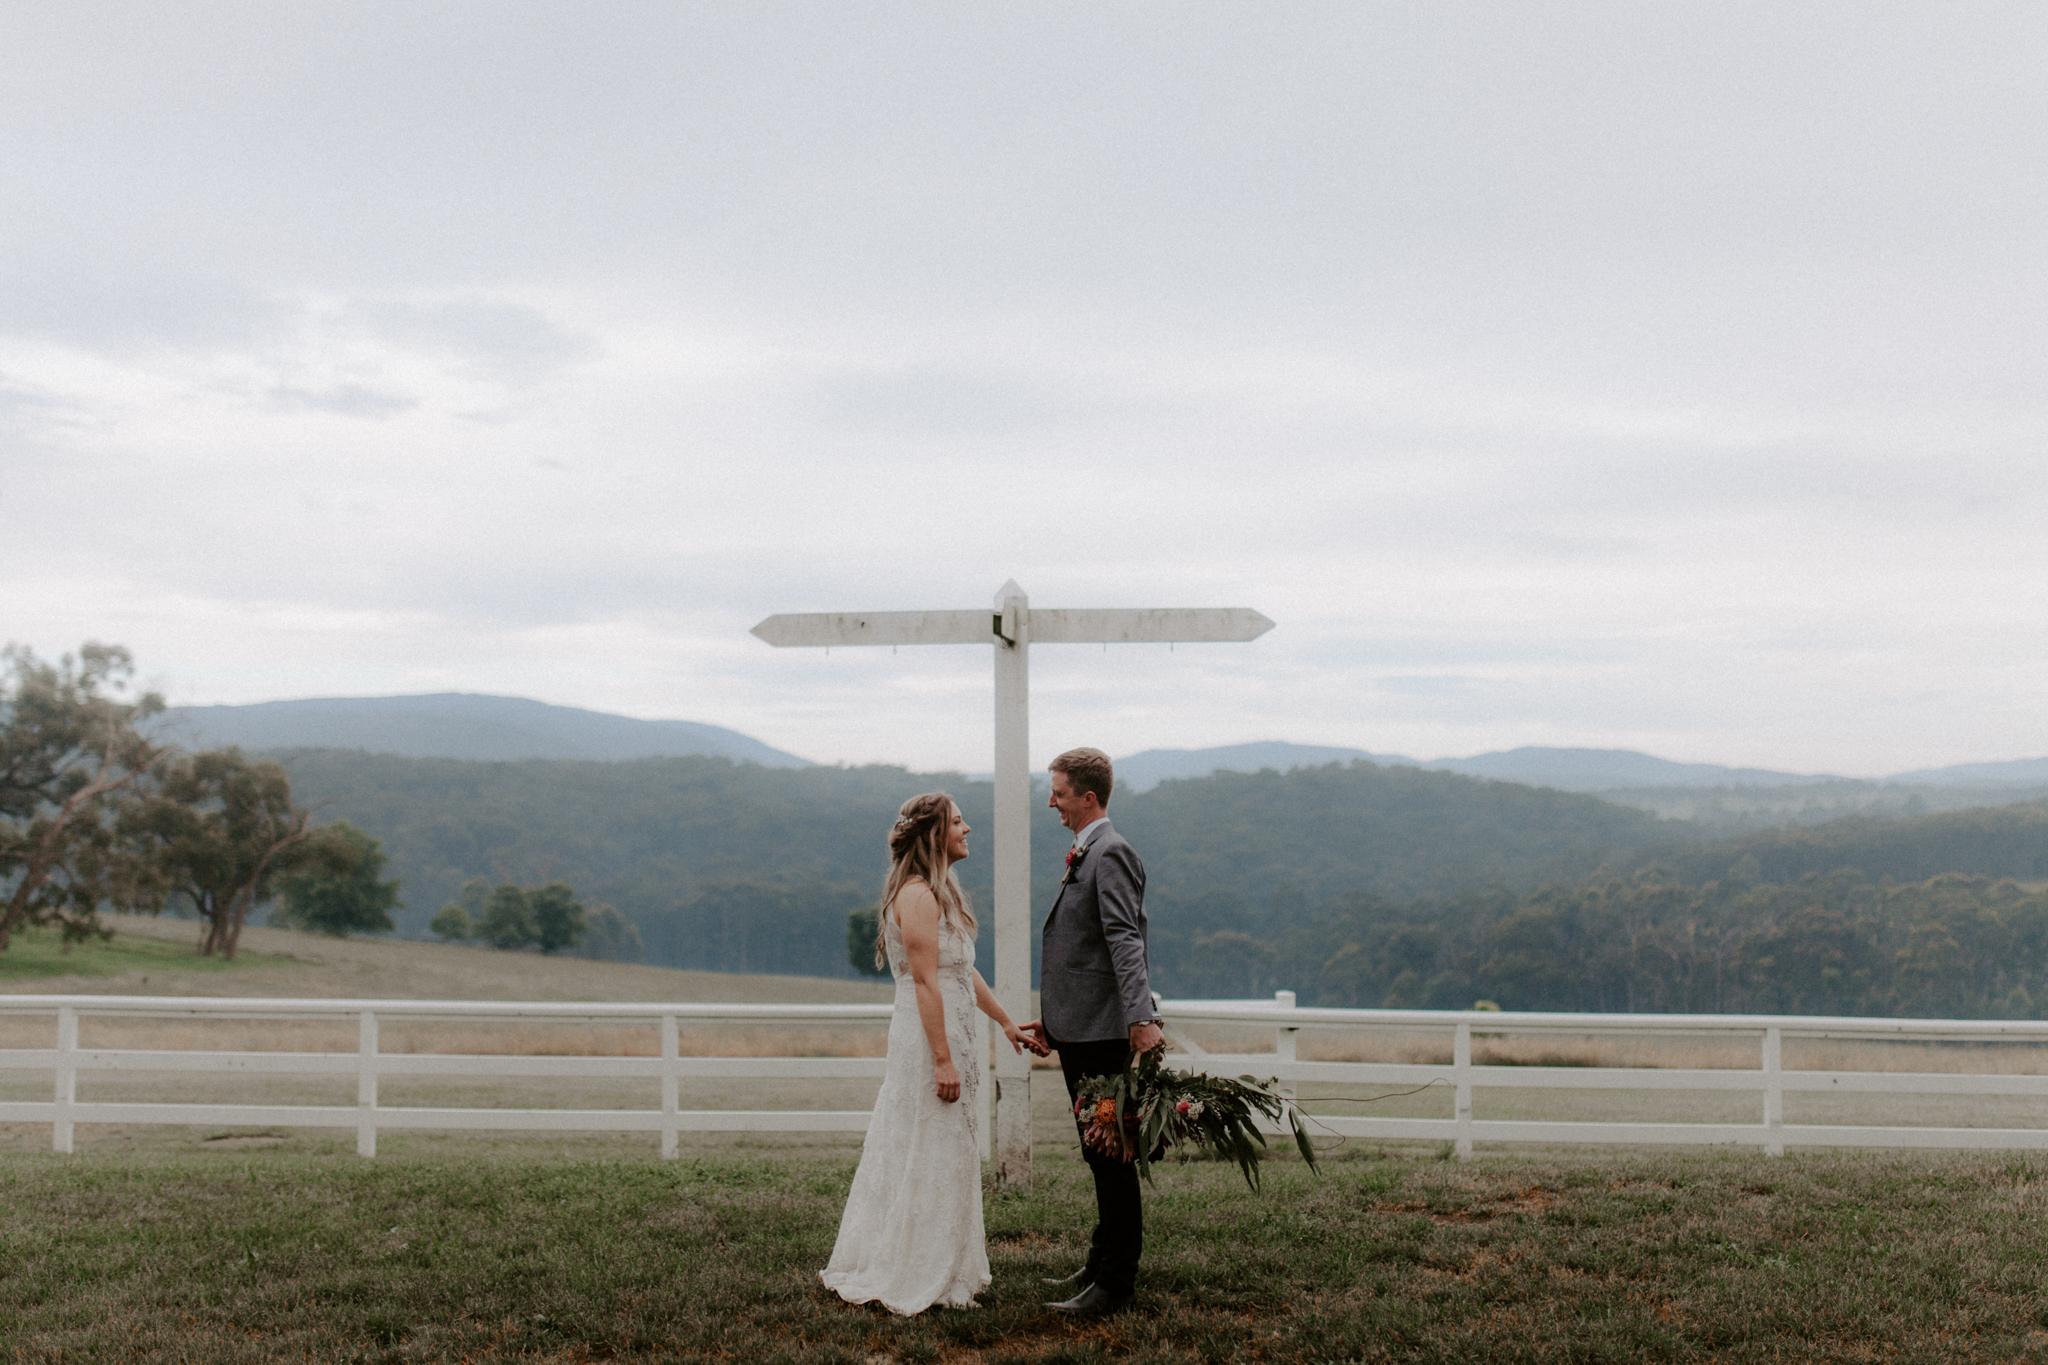 Wandin-Park-Estate-Wedding-Emotions-and-Math-Photography-130.jpg